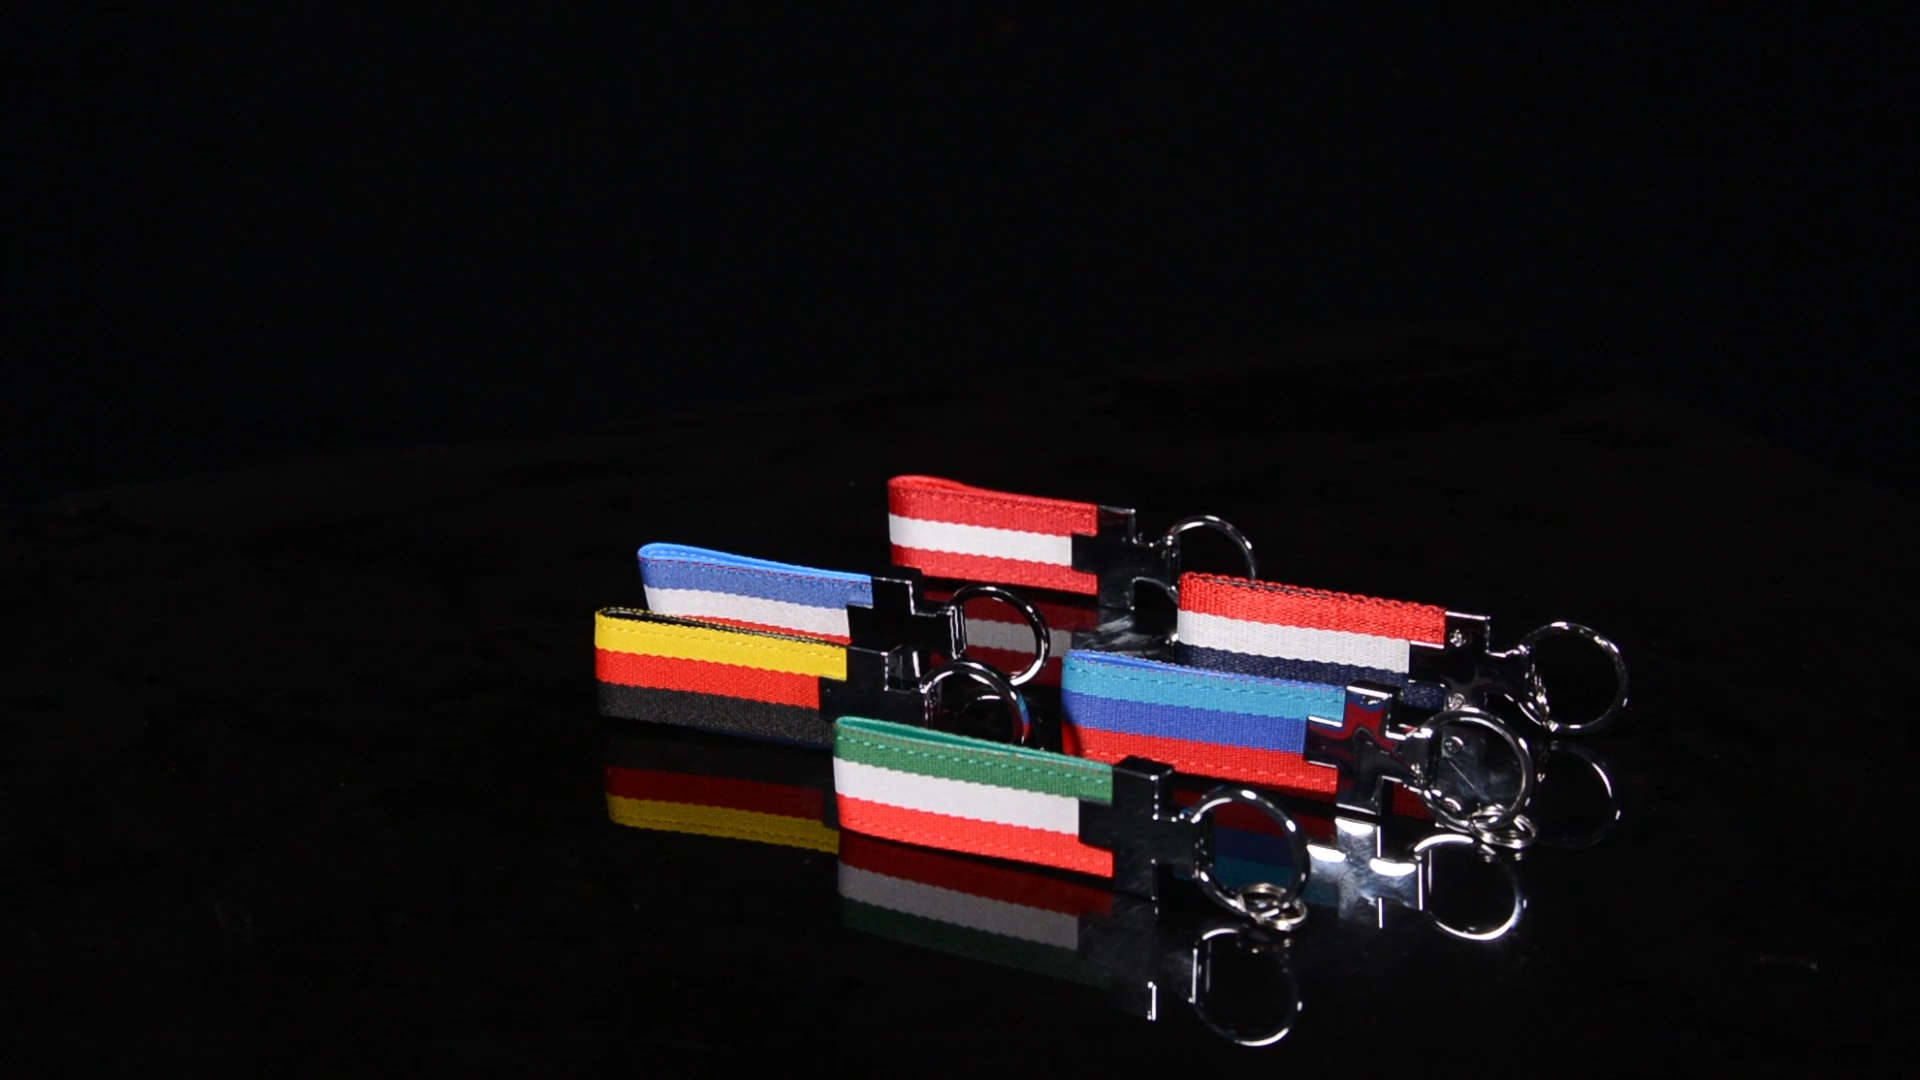 vespa parts cute custom metal keychain key holder ring custom logo vespa sprint gts lx125